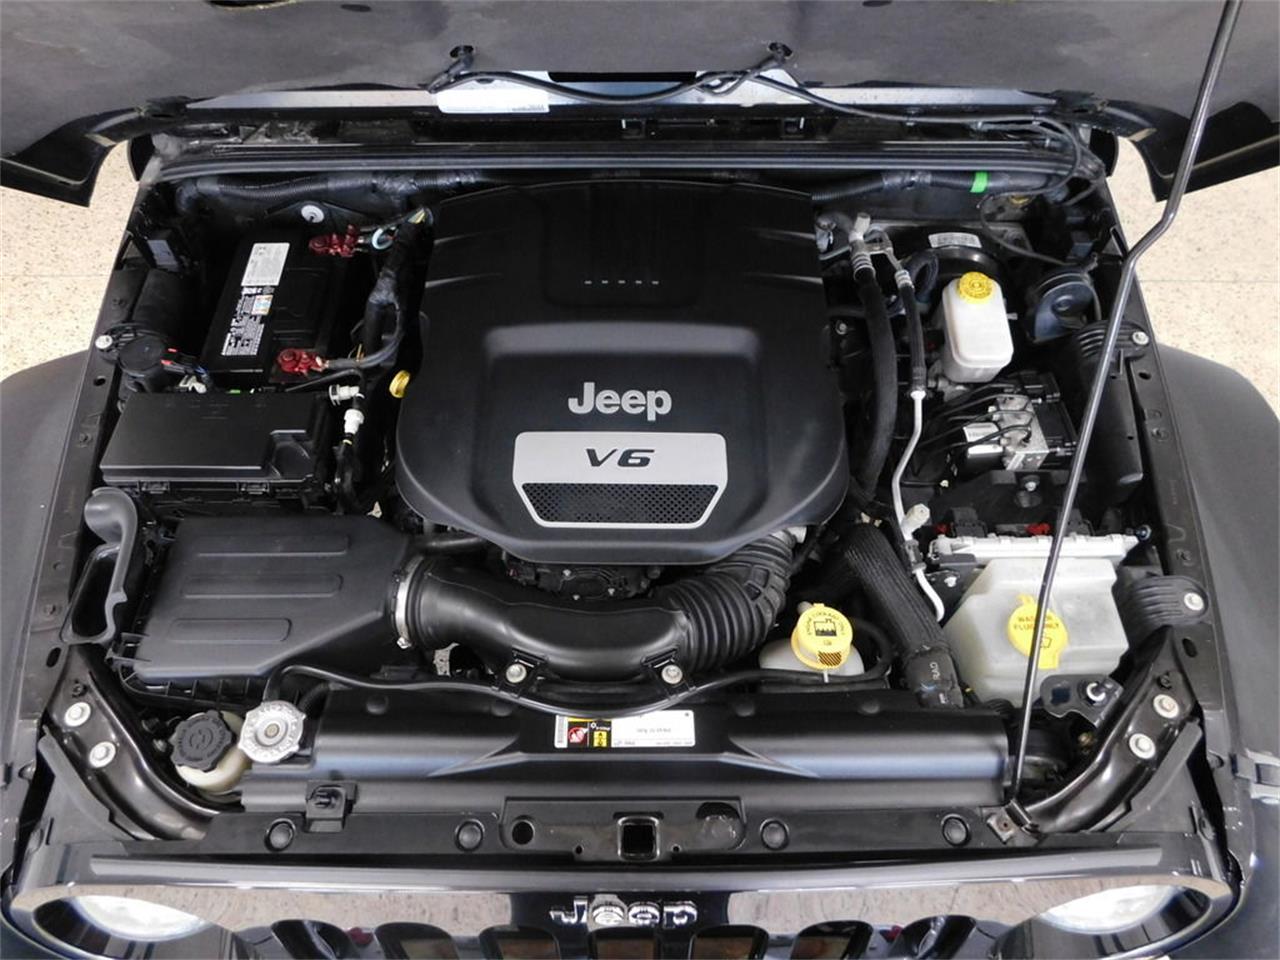 2016 Jeep Wrangler (CC-1411105) for sale in Hamburg, New York